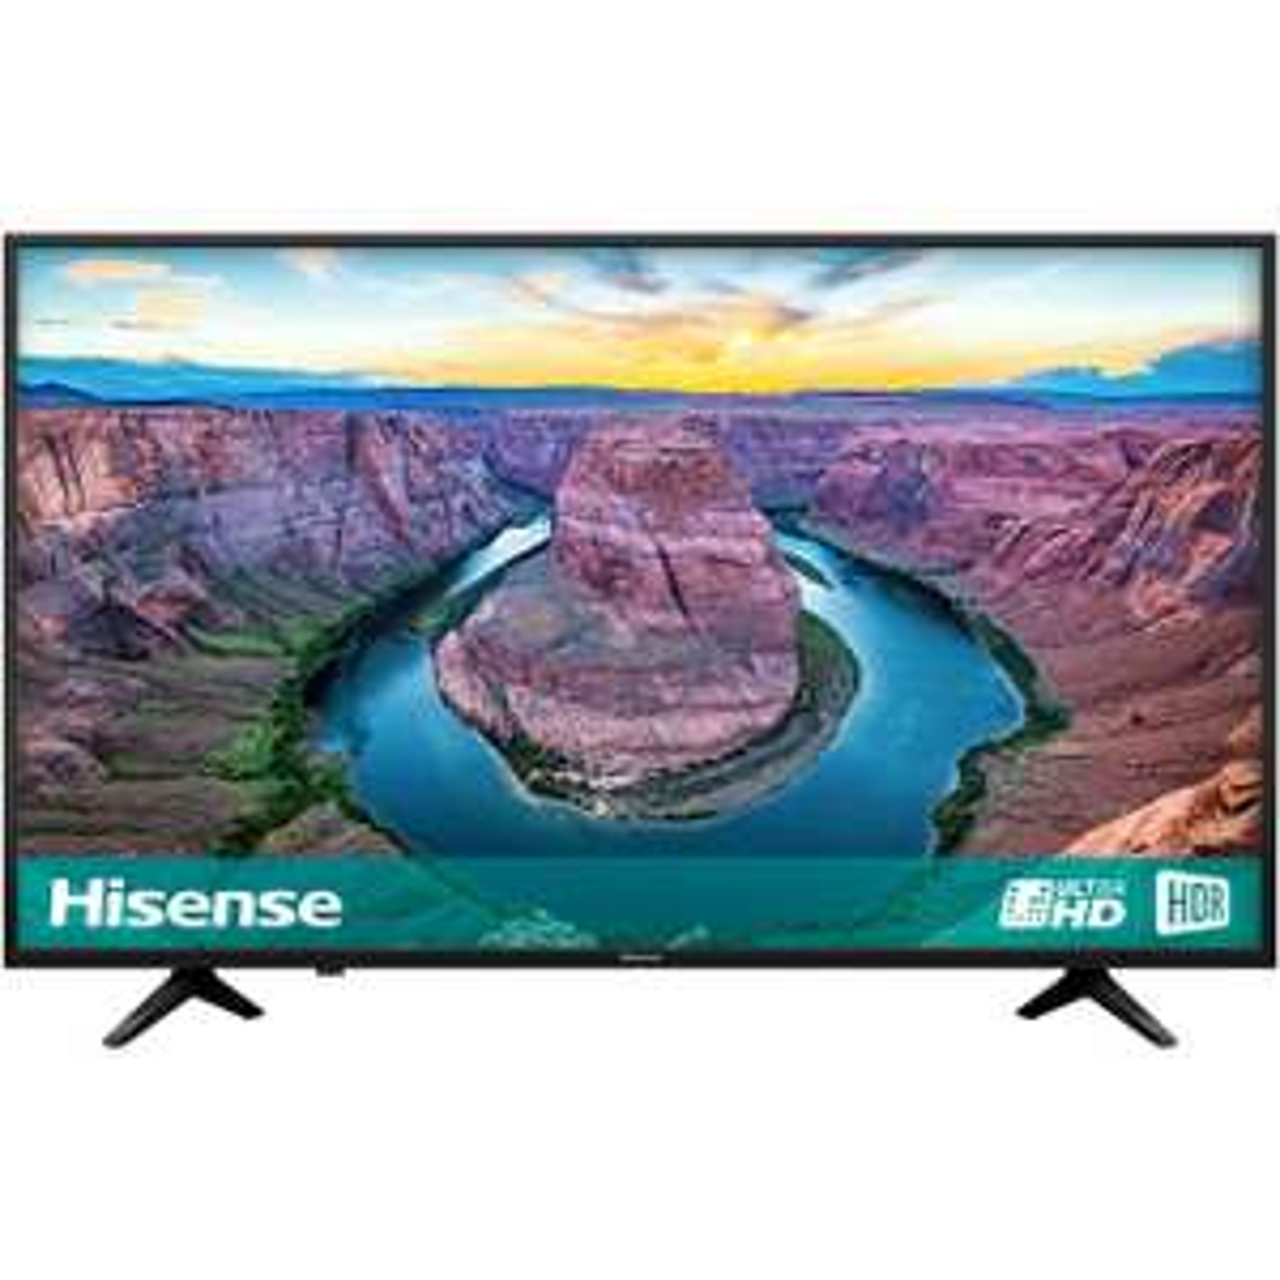 "Hisense H58AE6100UK 58"" Smart 4K Ultra HD TV,HDR10 5 Year Warranty 359.99 @ costco"